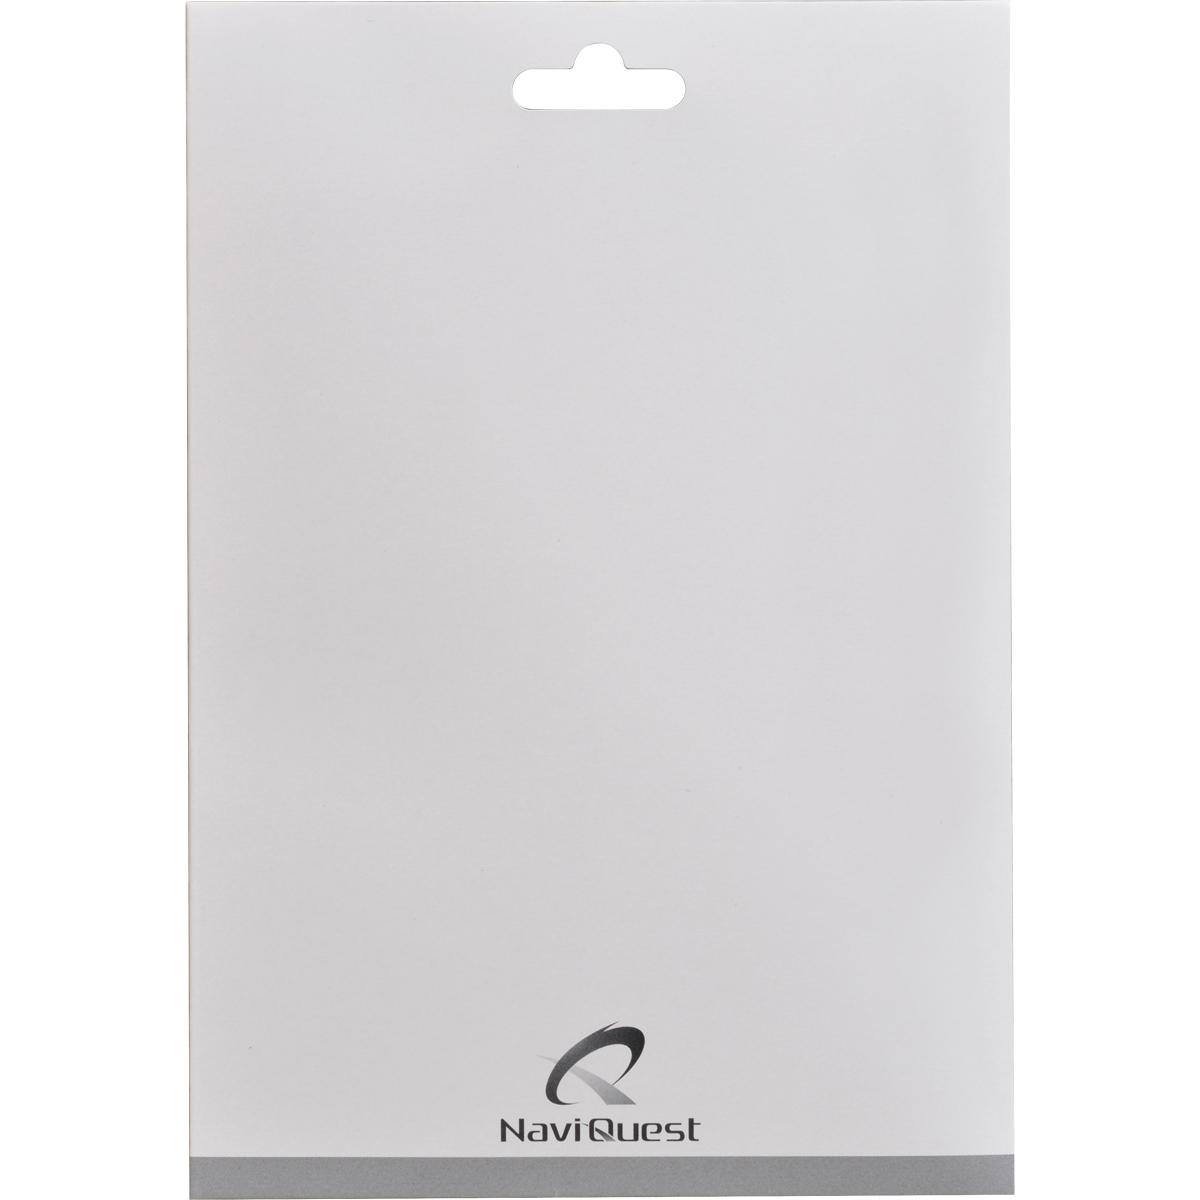 「RQ-E716PV」専用2018年春版地図更新SDカード